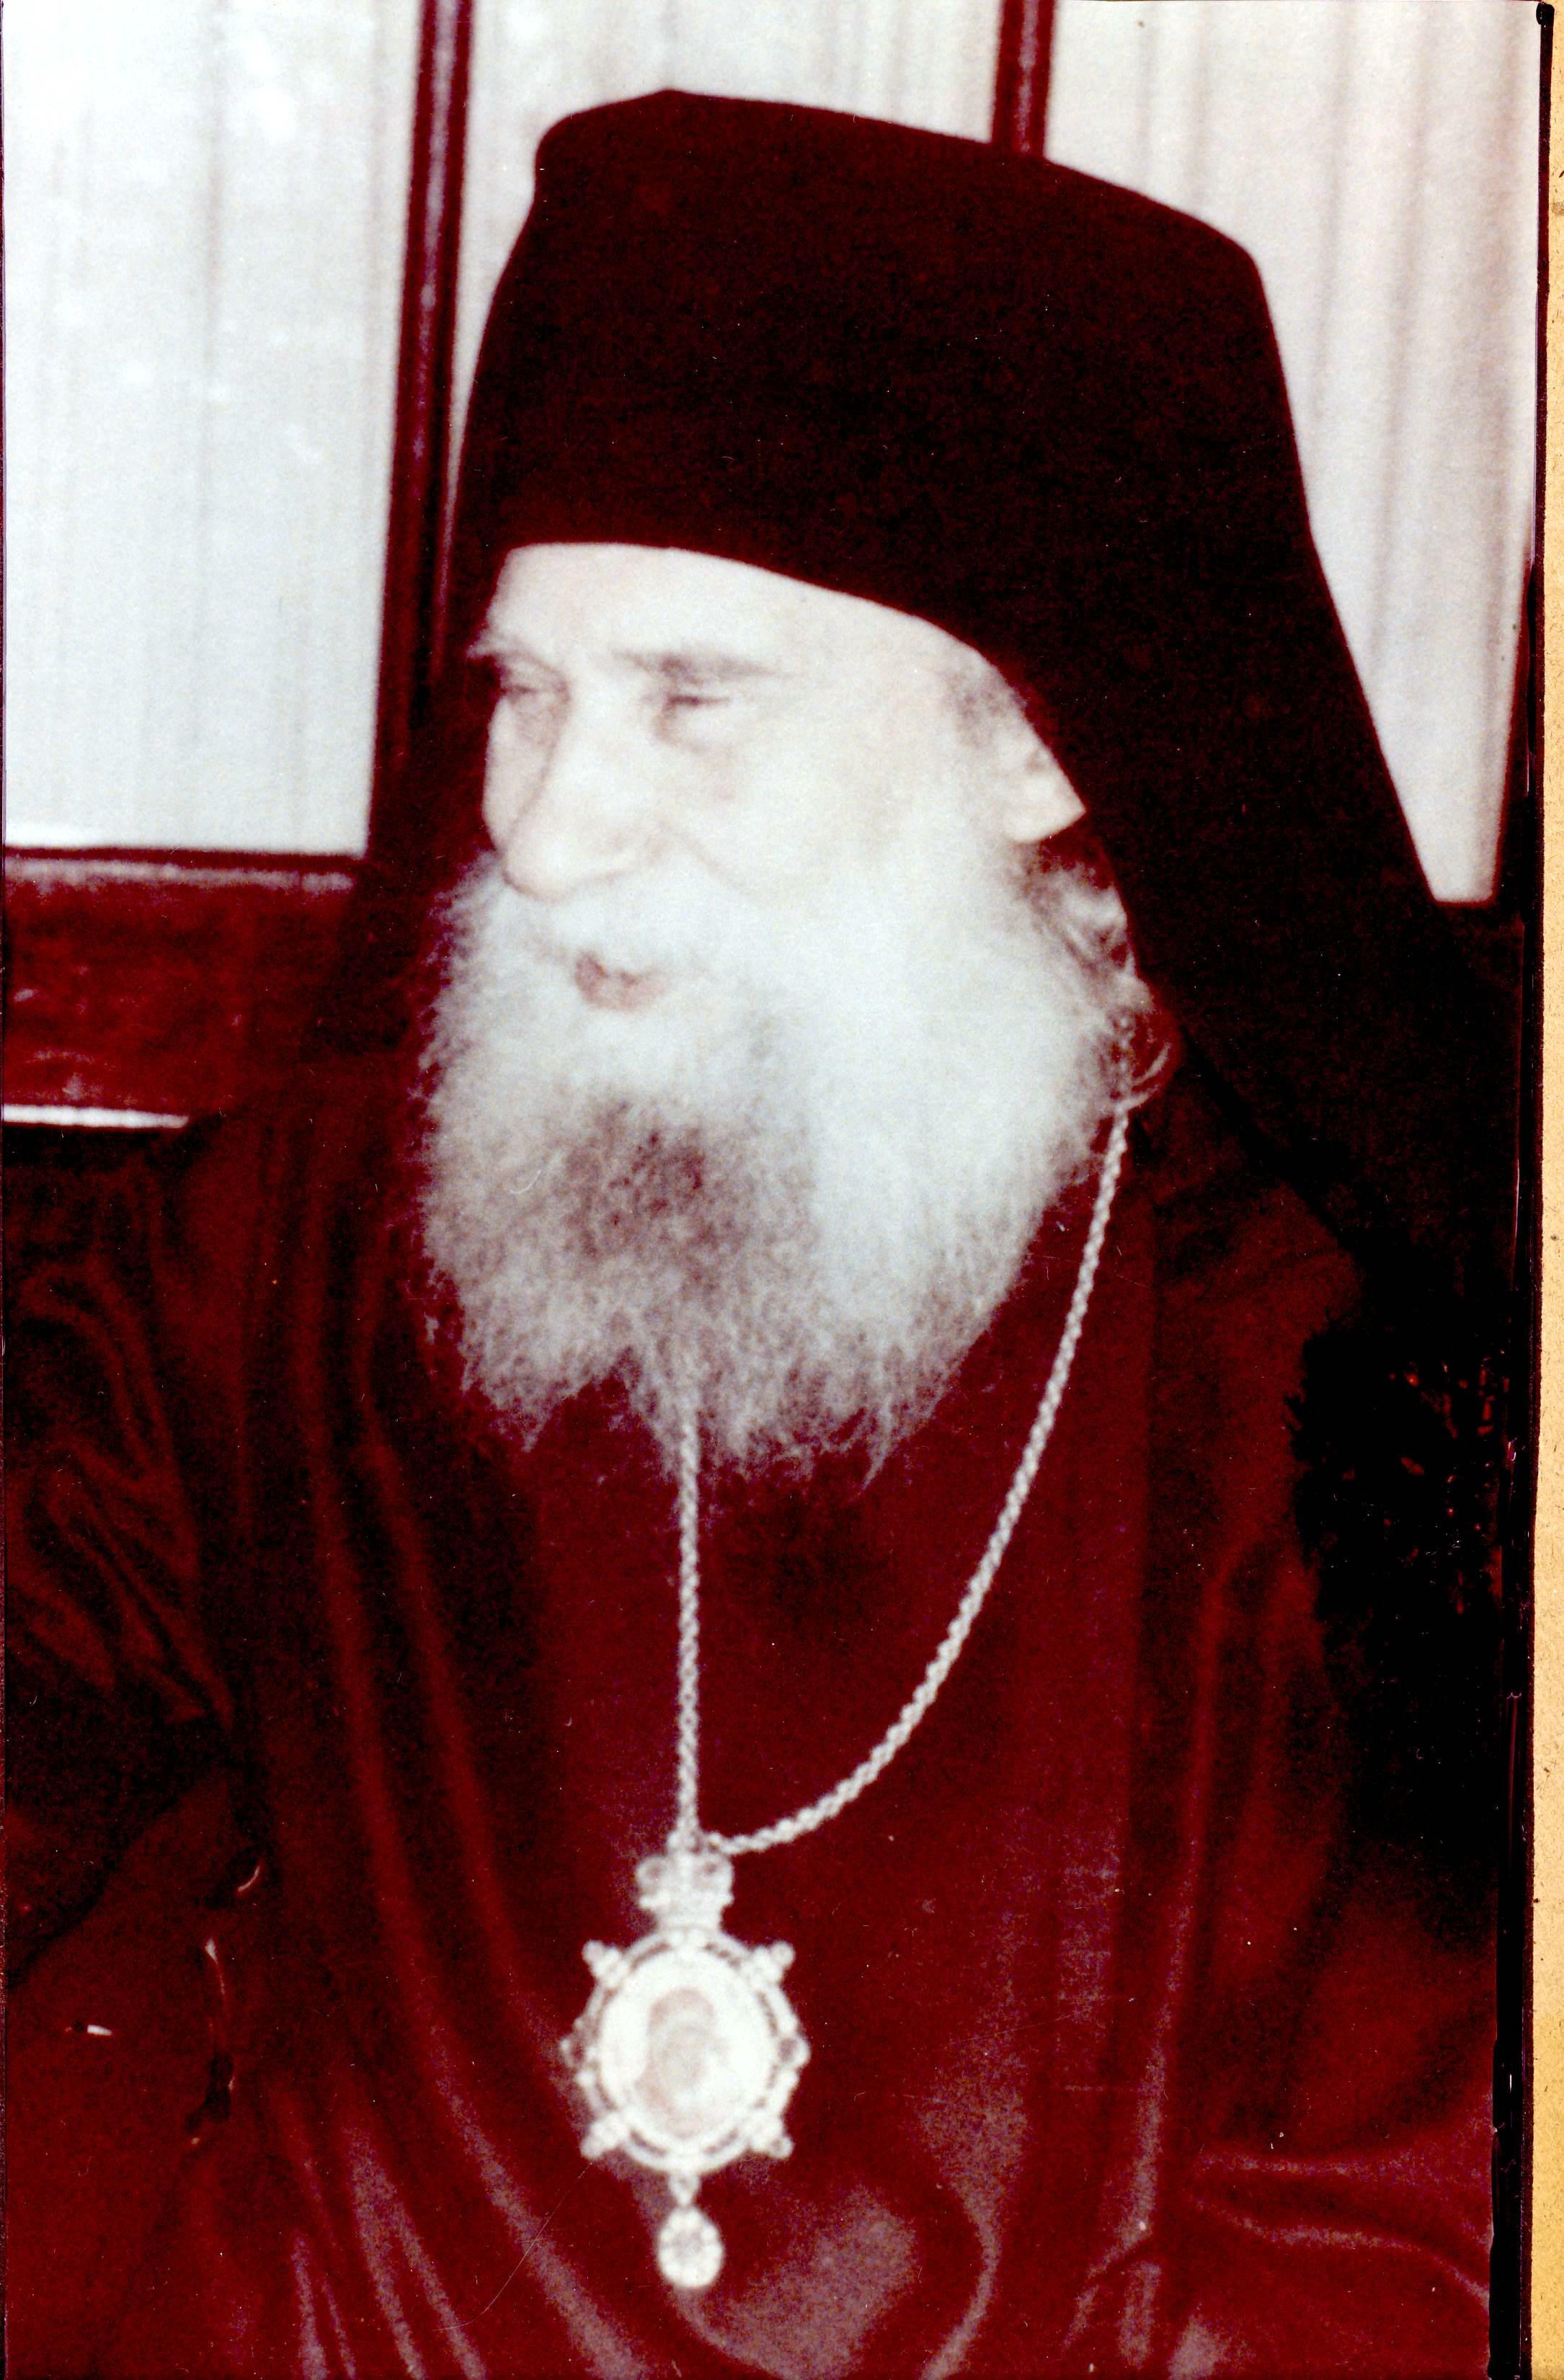 George Tarassov Arhiepiscop de Syracusa hp 4